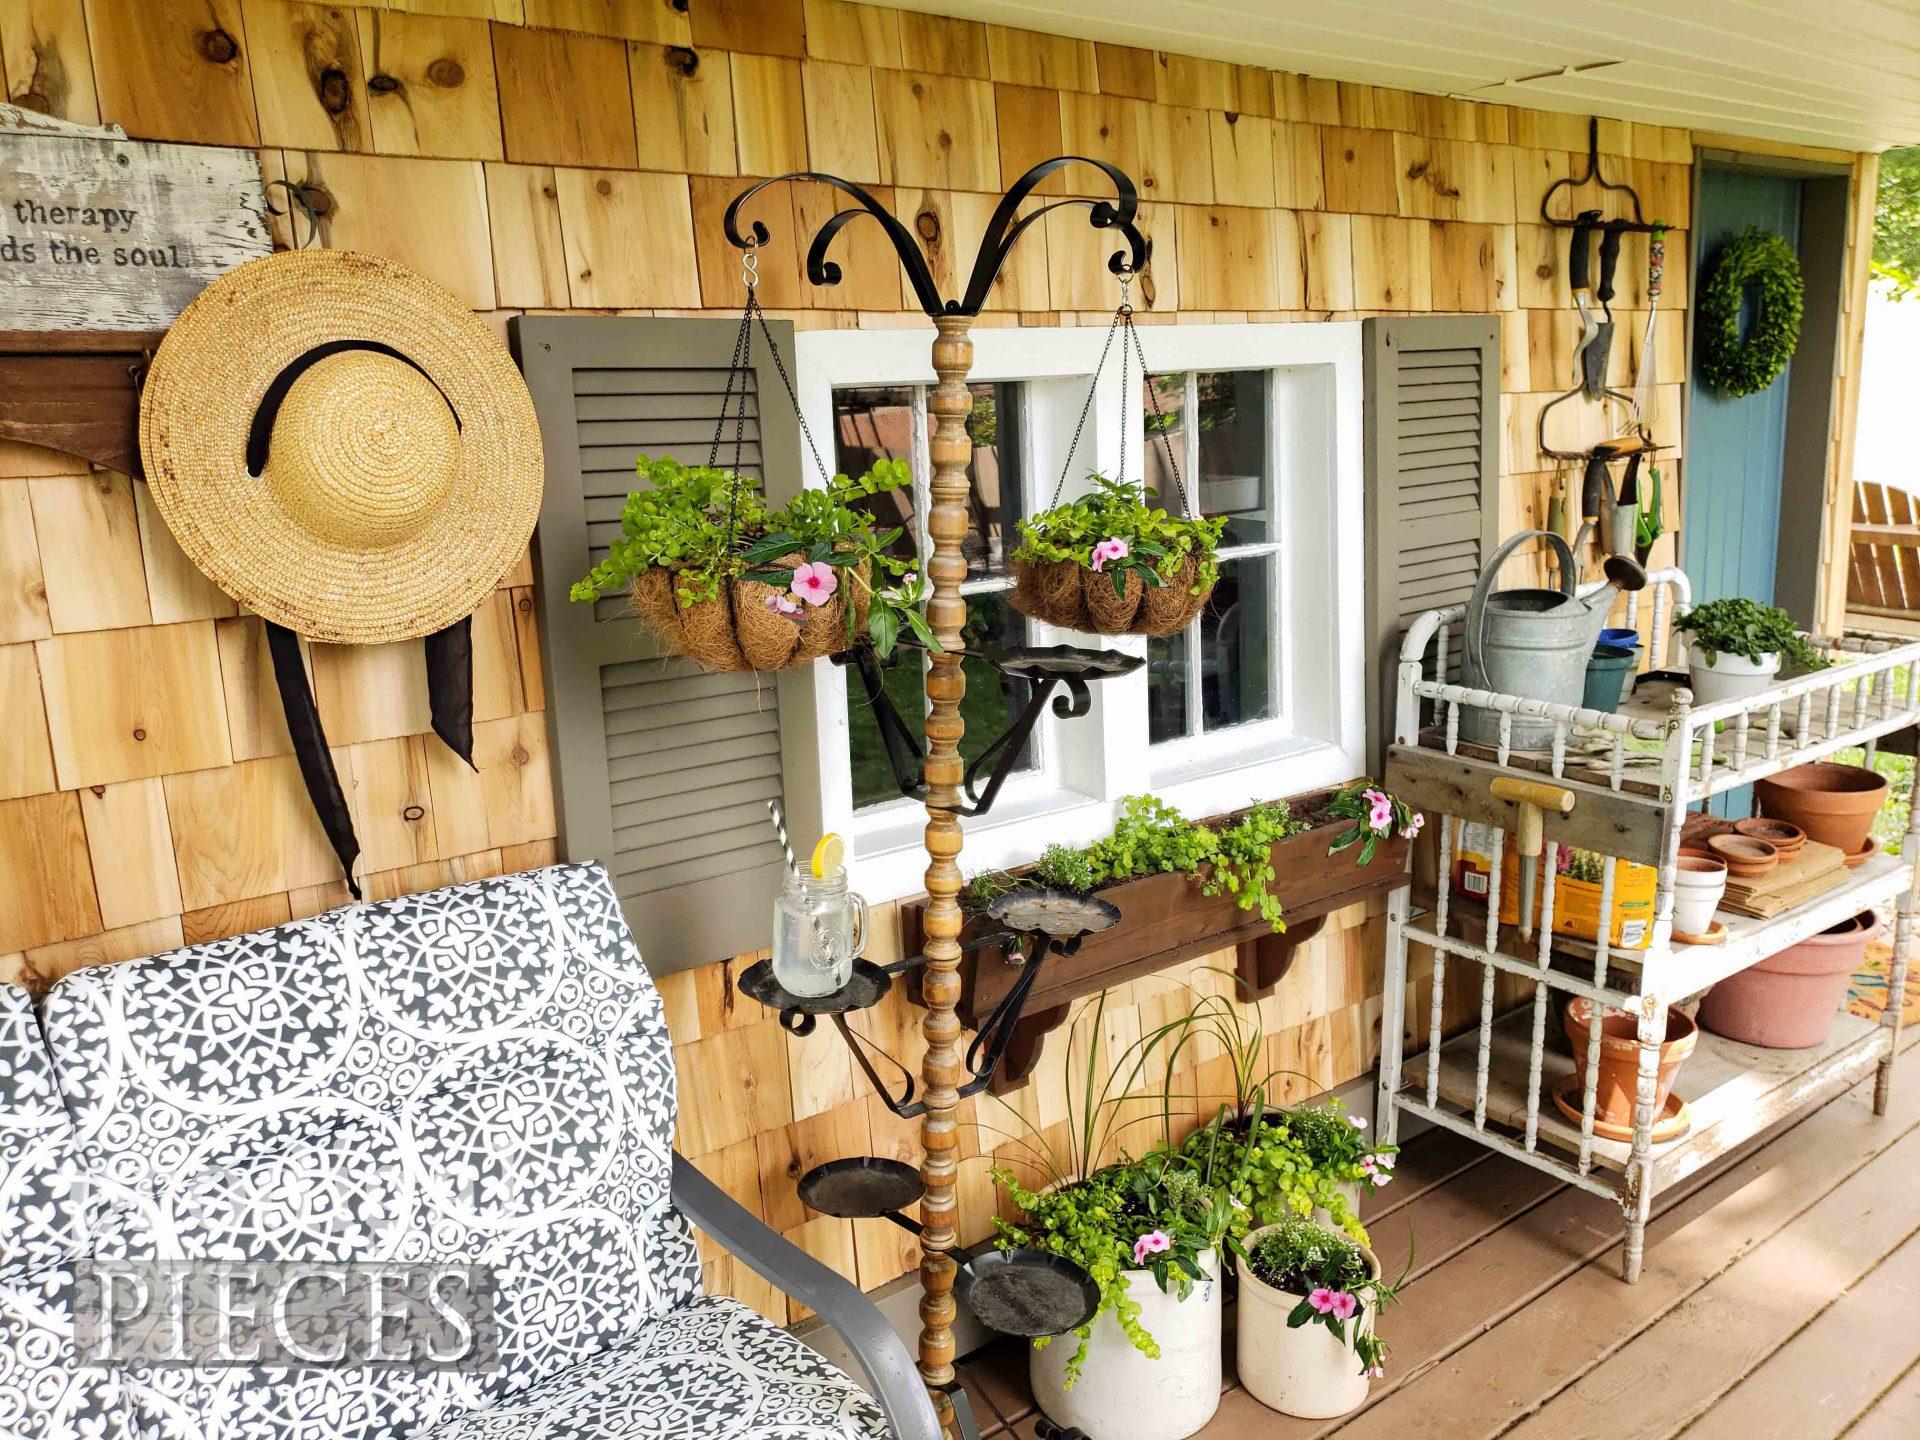 DIY Cedar Shake Shed with Decor by Larissa of Prodigal Pieces | prodigalpieces.com #prodigalpieces #diy #garden #farmhouse